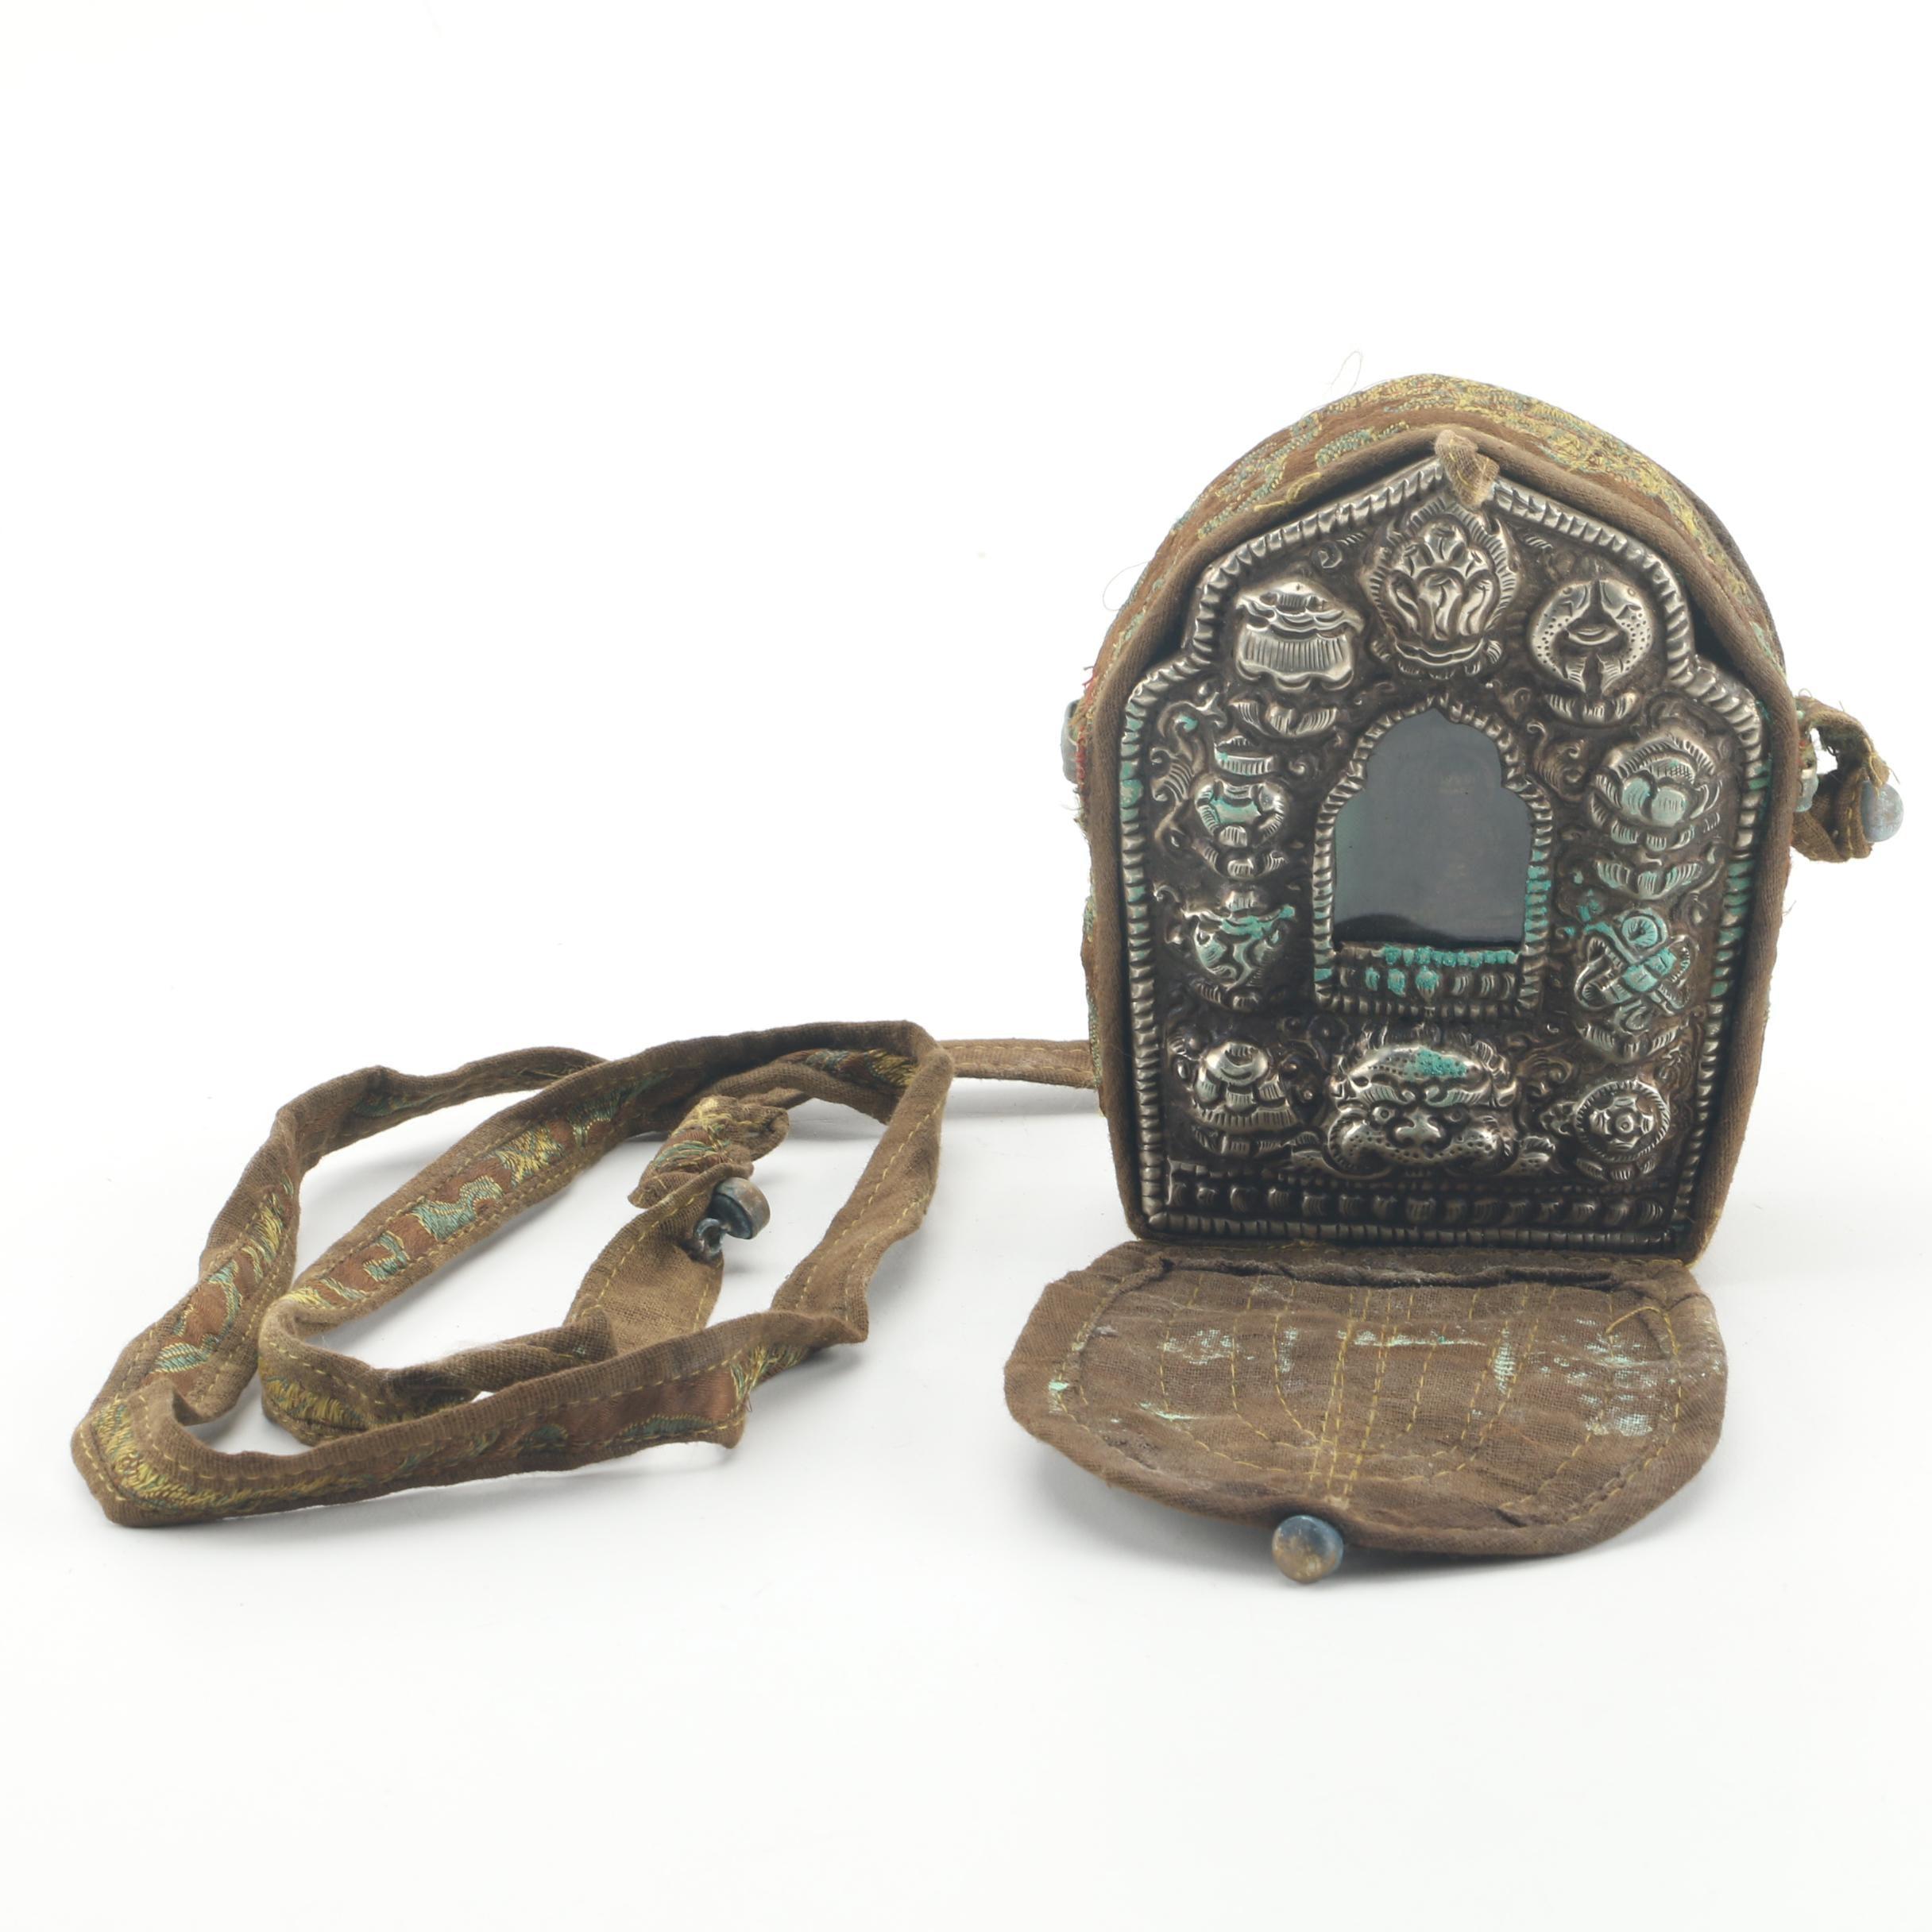 Tibetan Gau Portable Shrine with Cloth Case